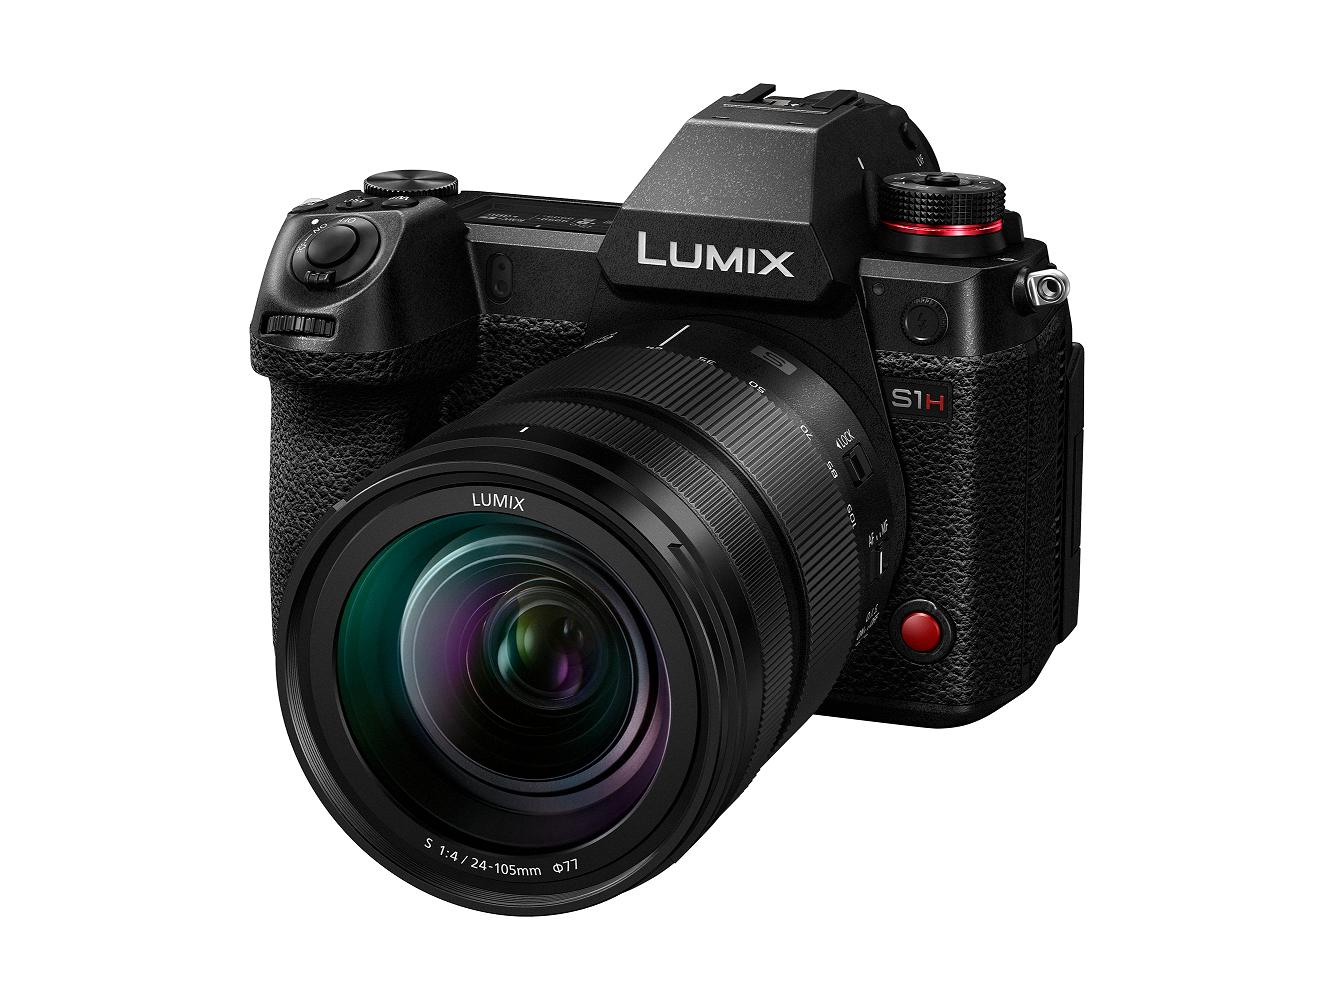 Panasonic Launches Lumix S1h World S First 6k Digital